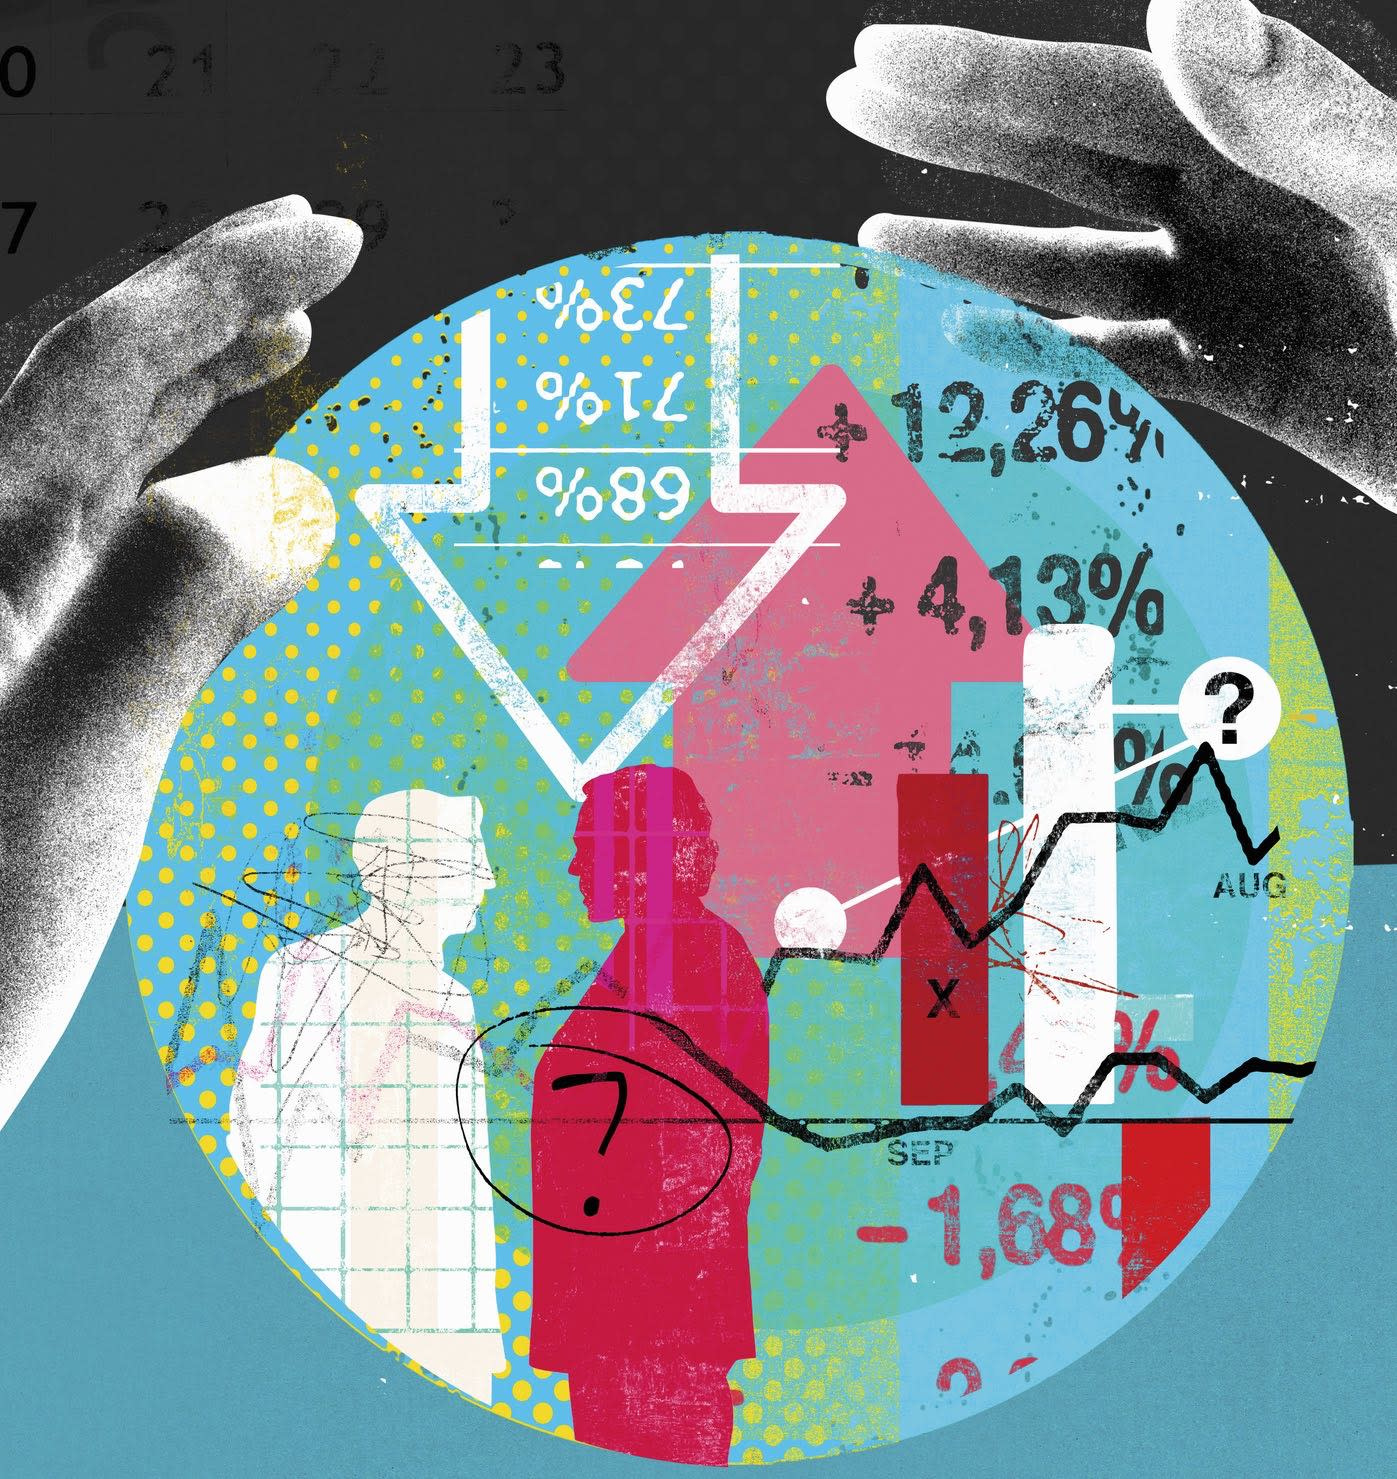 Hands around finance data inside of crystal ball